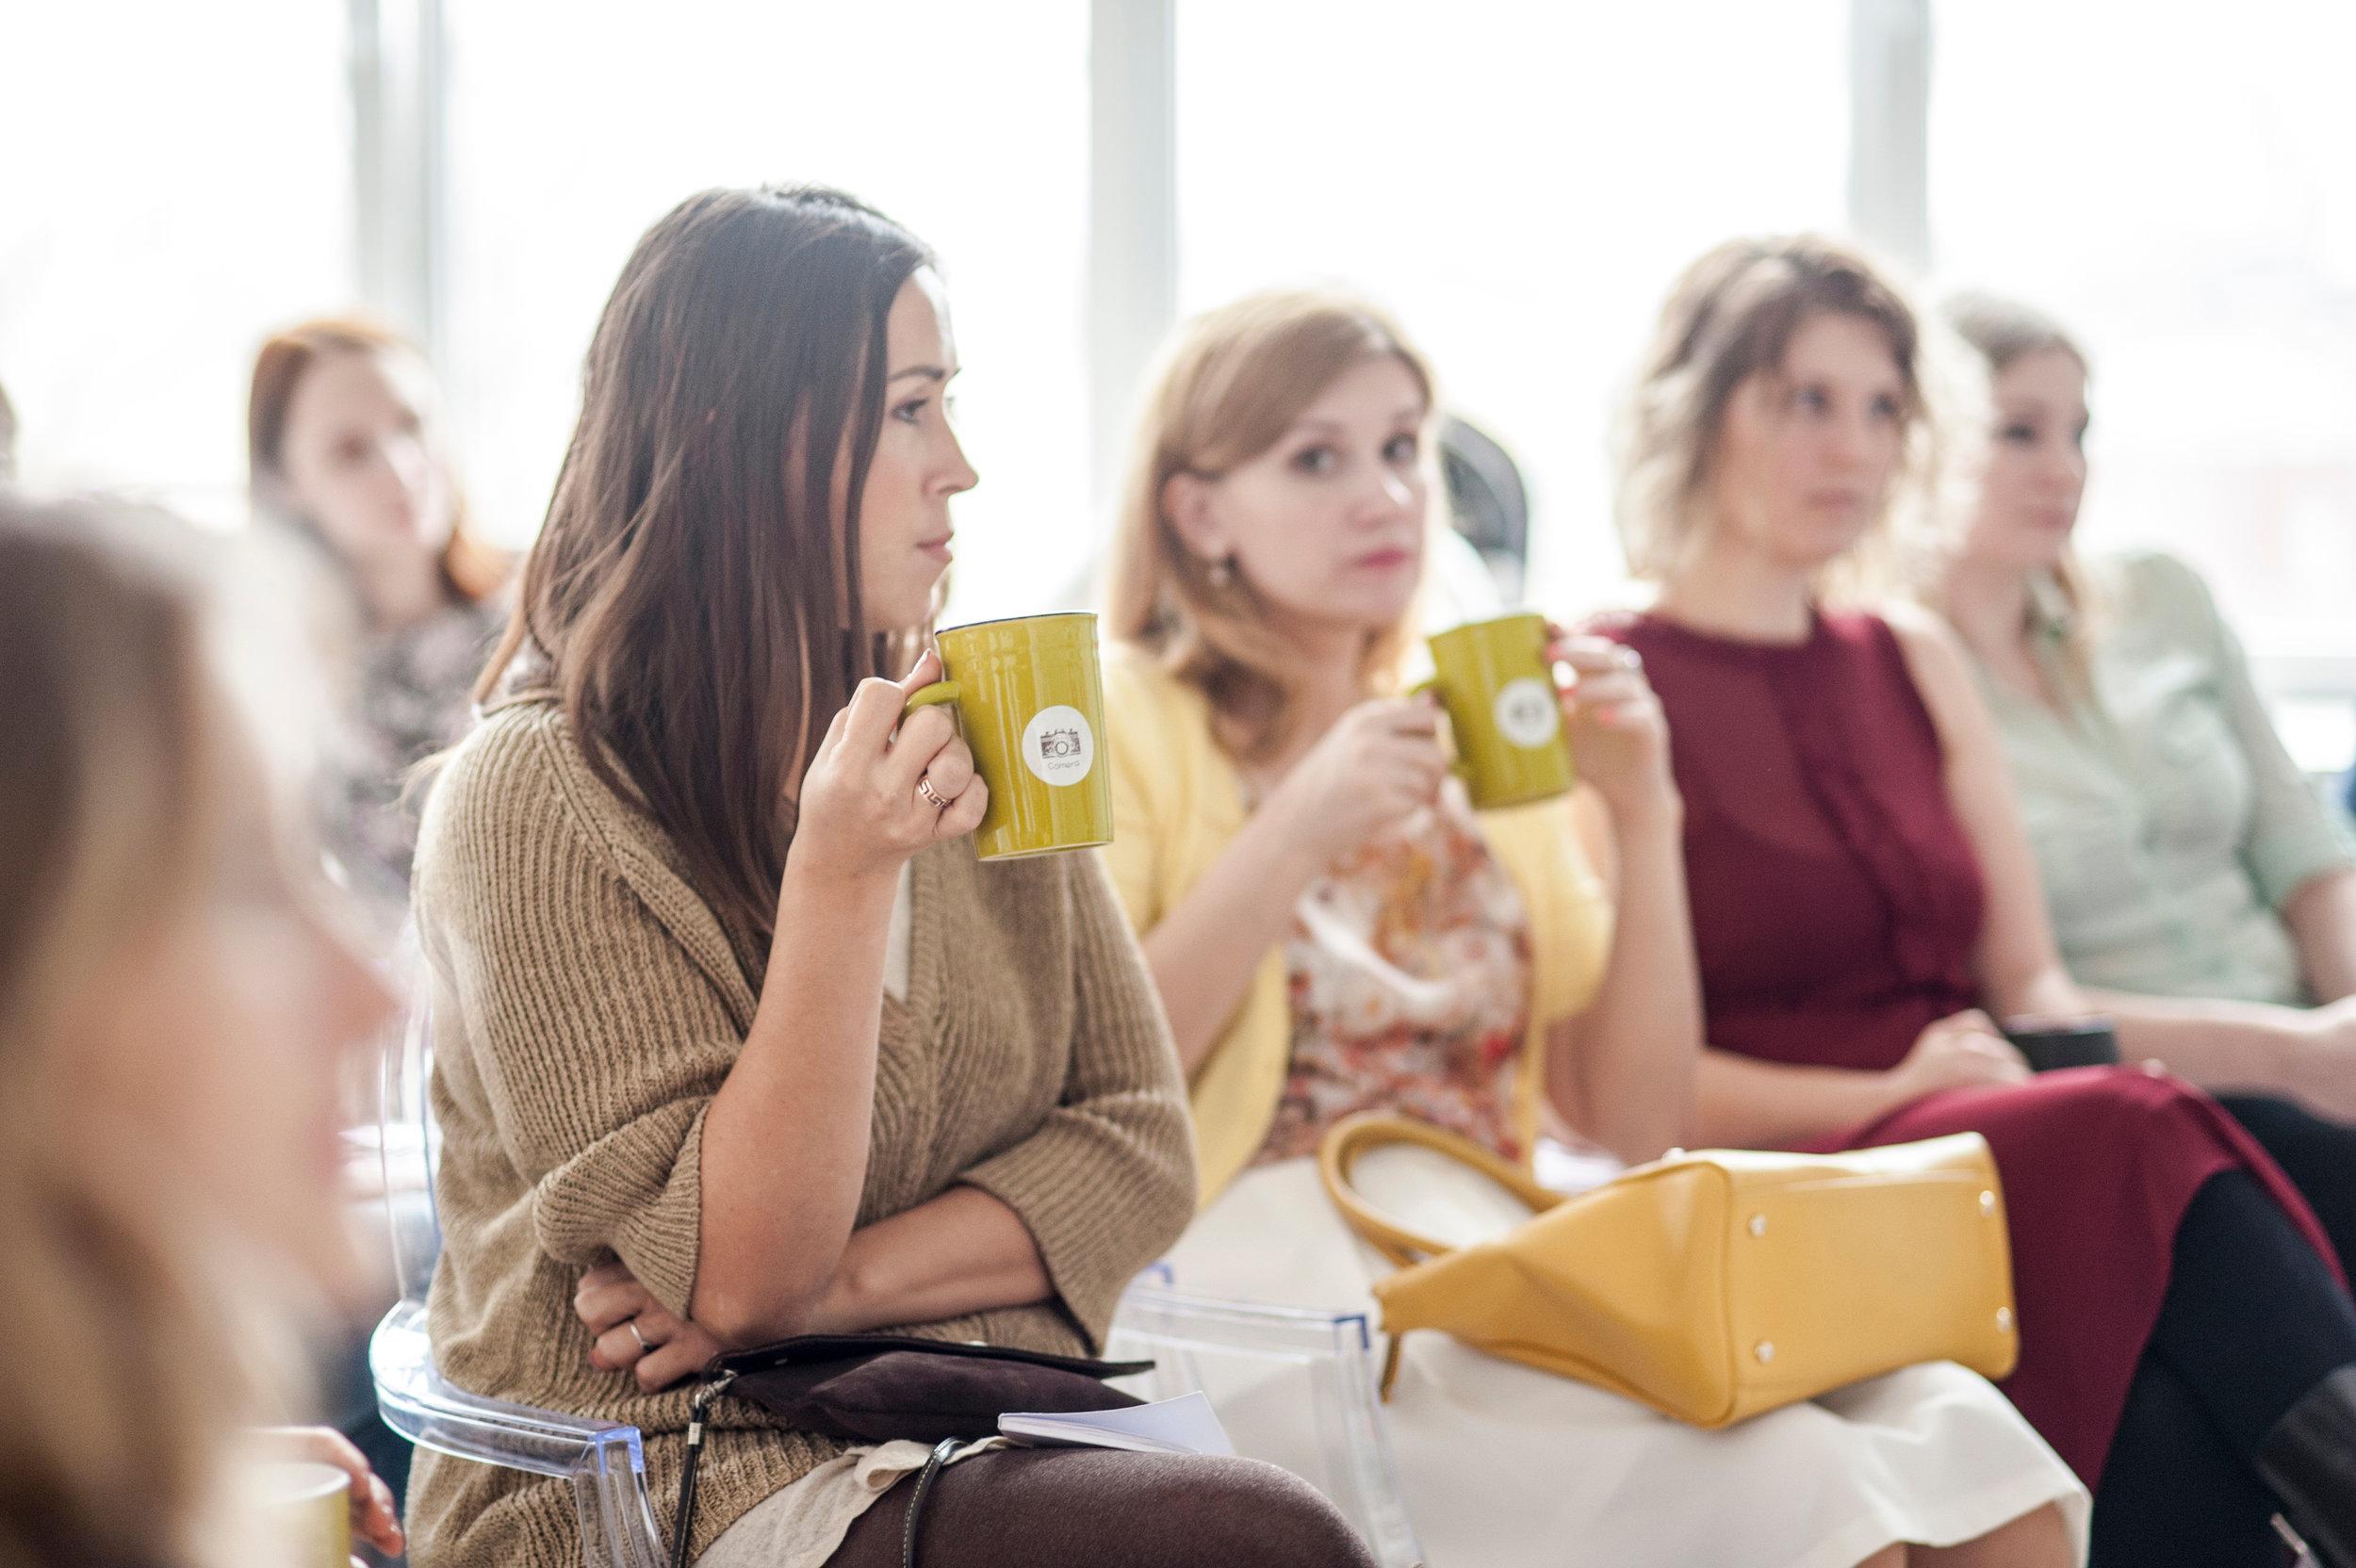 Canva - Woman Wearing Brown Corduroy Coat Holding Mug While Sitting on Chair.jpg